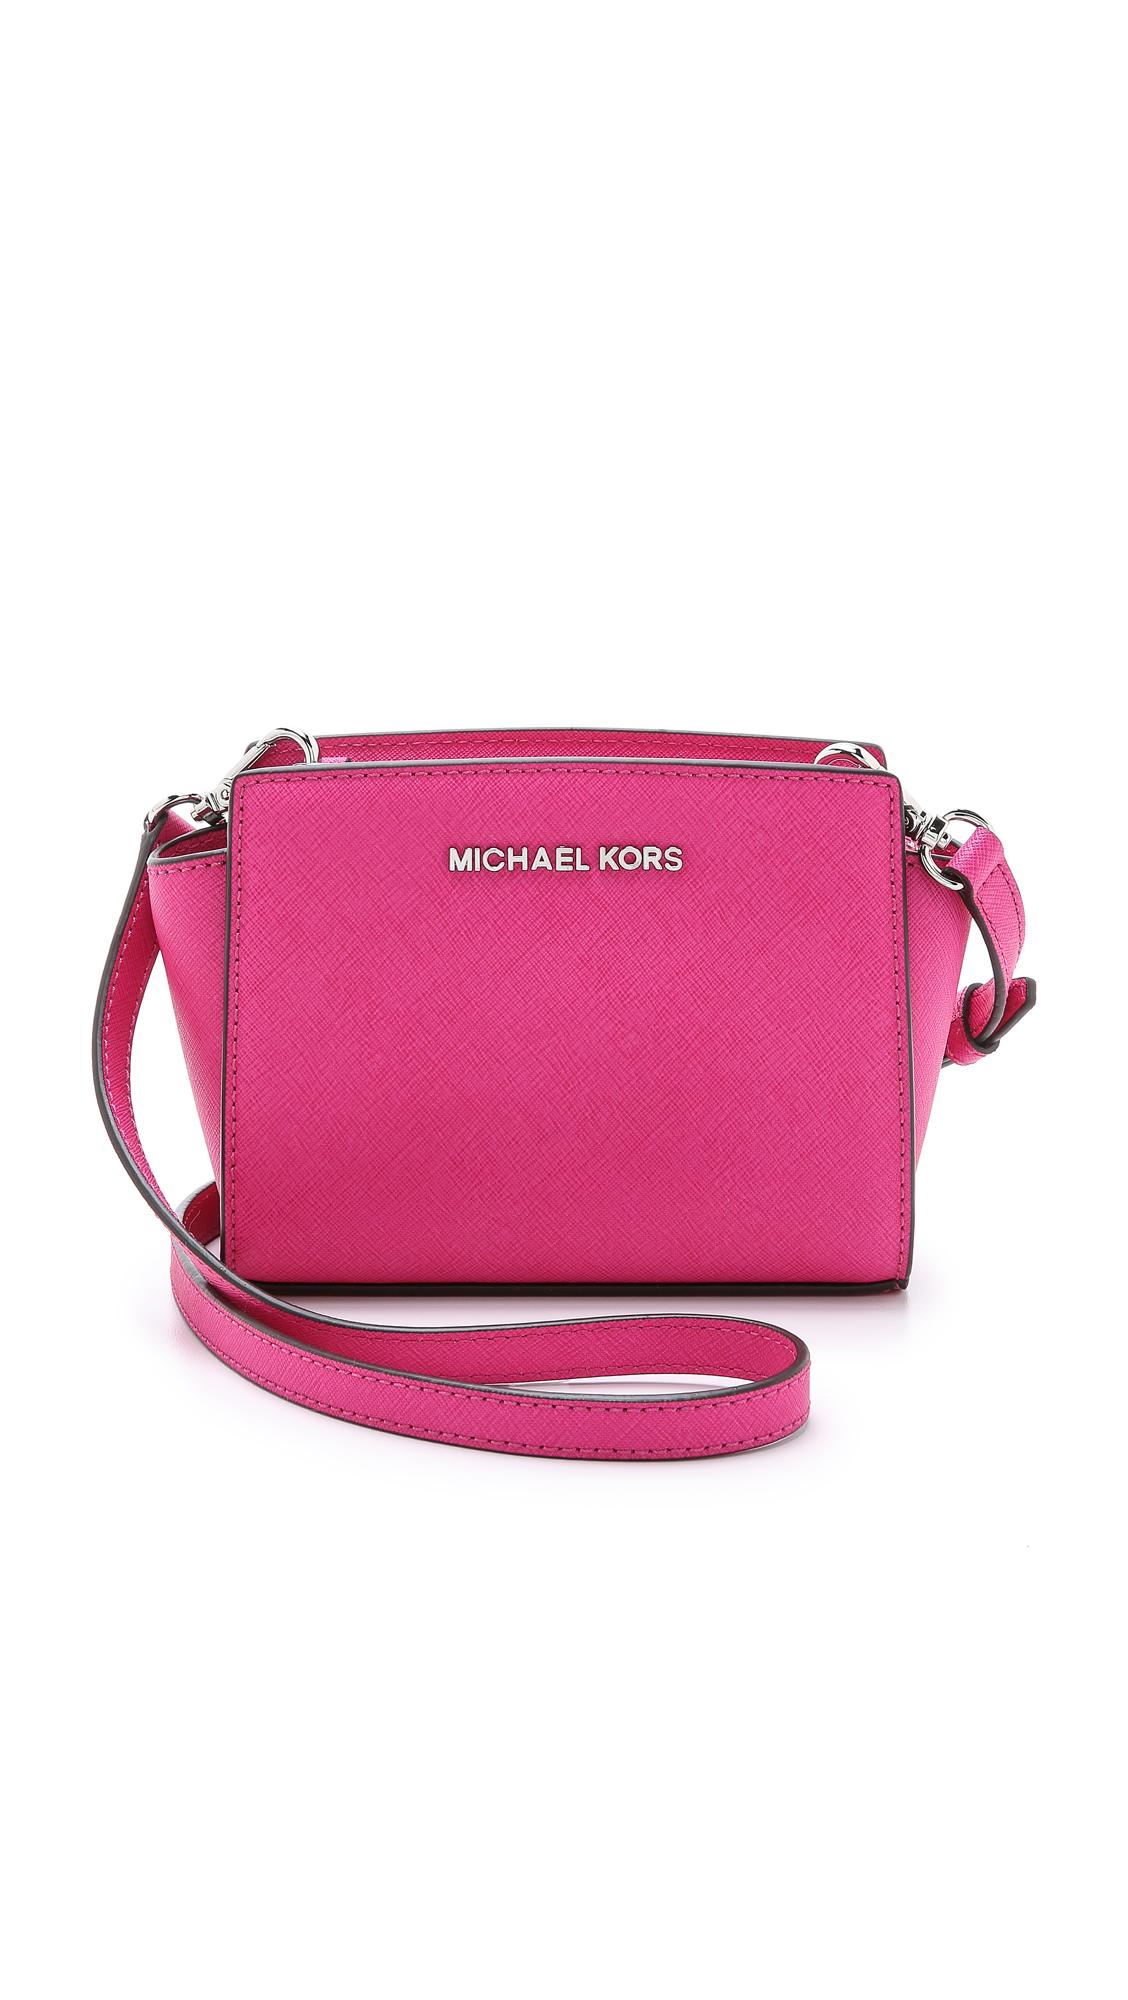 fd0e6068d9e MICHAEL Michael Kors Red Selma Mini Messenger Bag - Raspberry